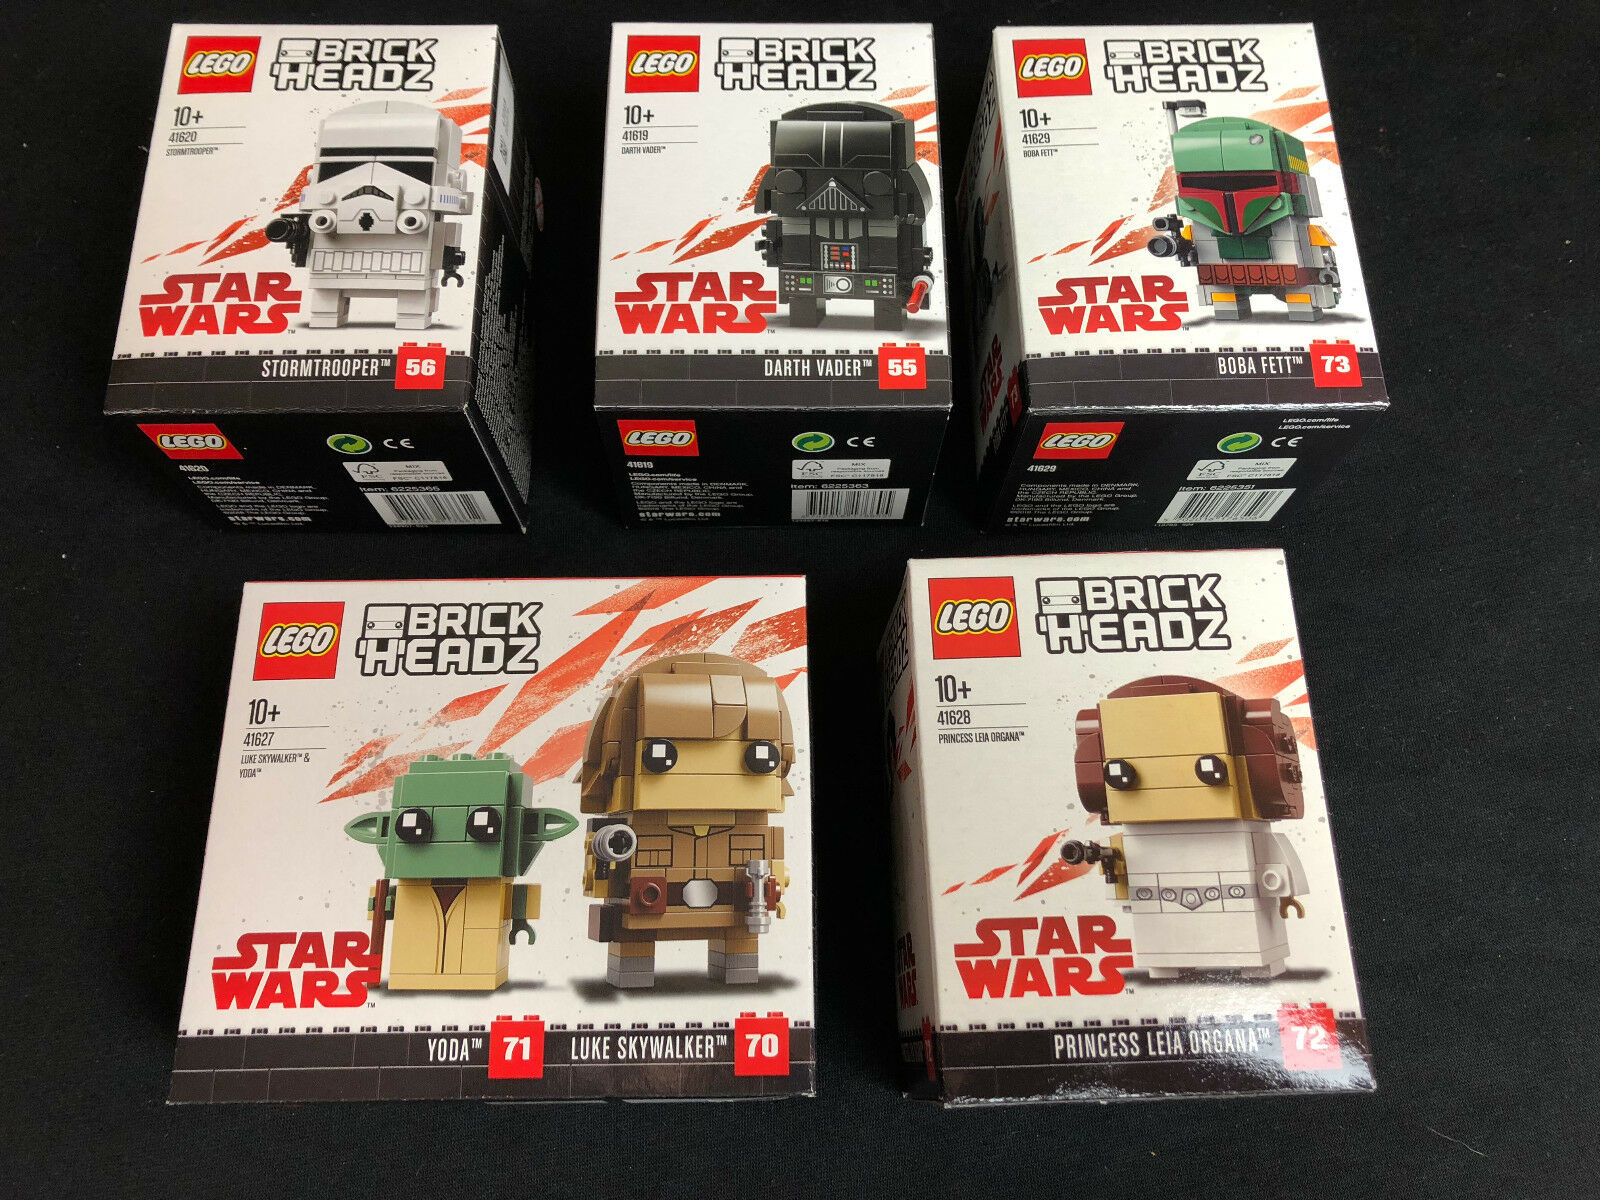 LEGO ®  41619 41620 41627 41628 41629  Brickheadz Vader Stormtrooper New Neu